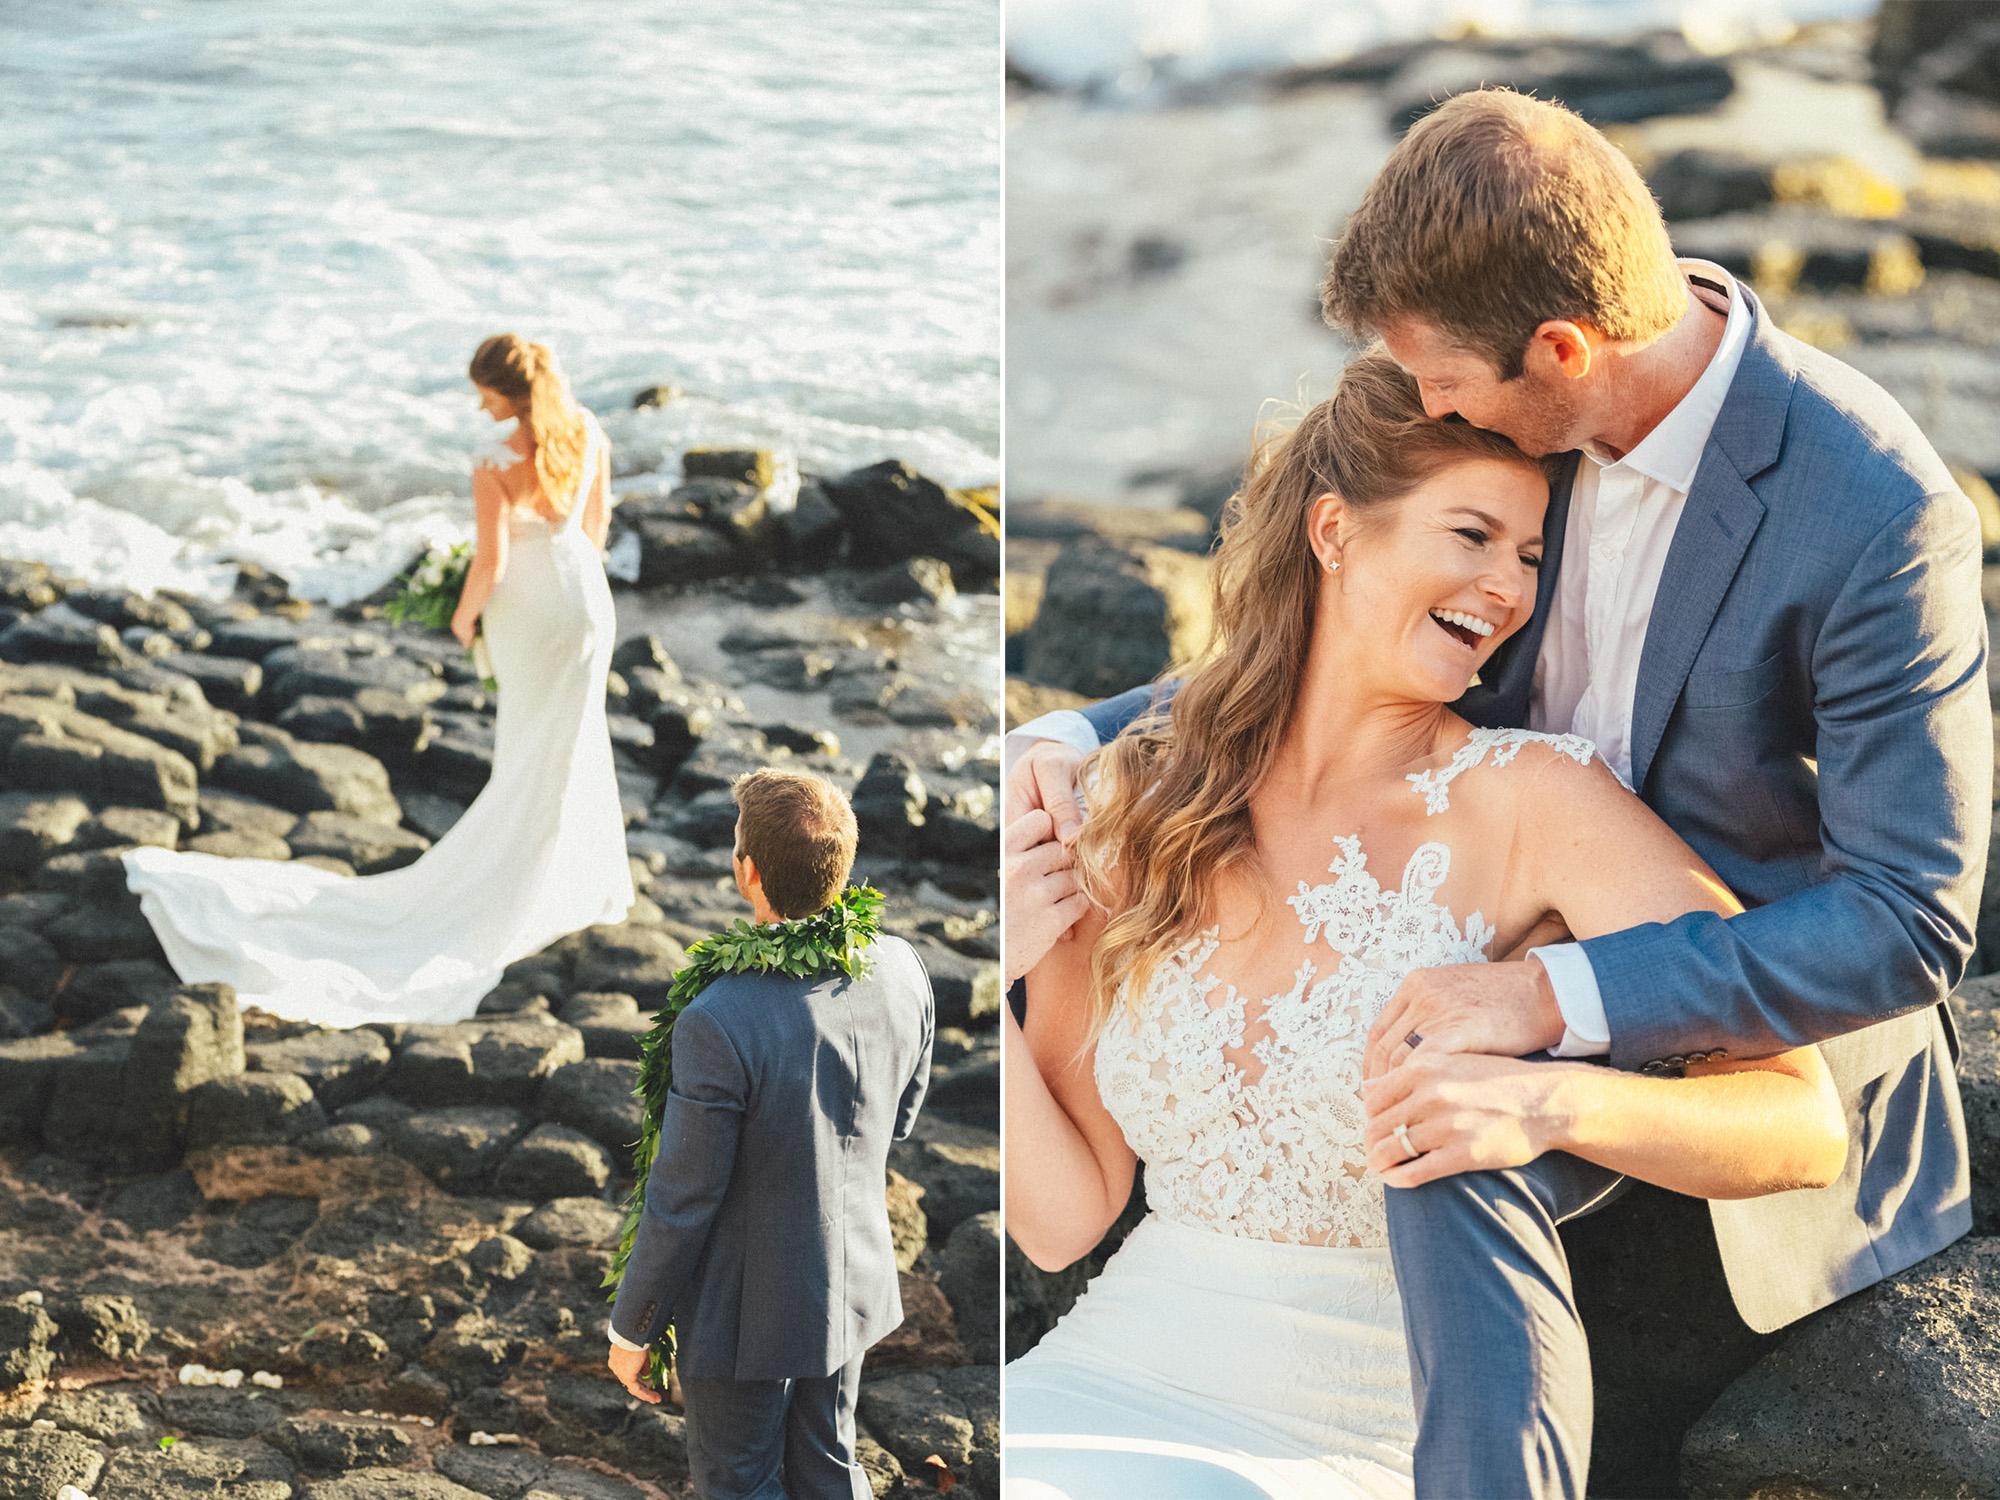 maui wedding photographer_226 copy.jpg